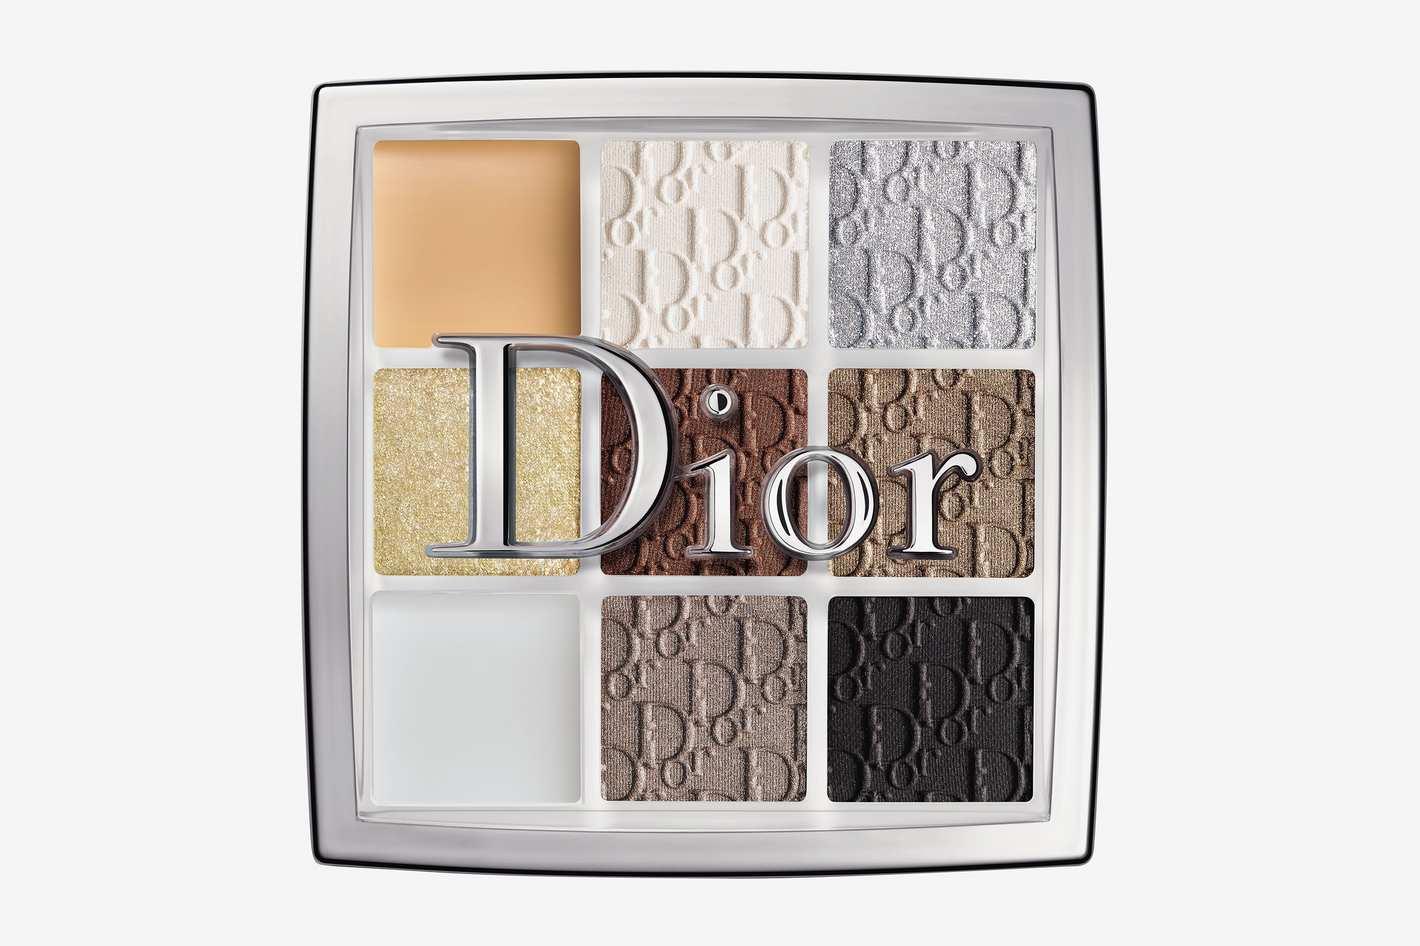 Dior Backstage Custom Eye Palette